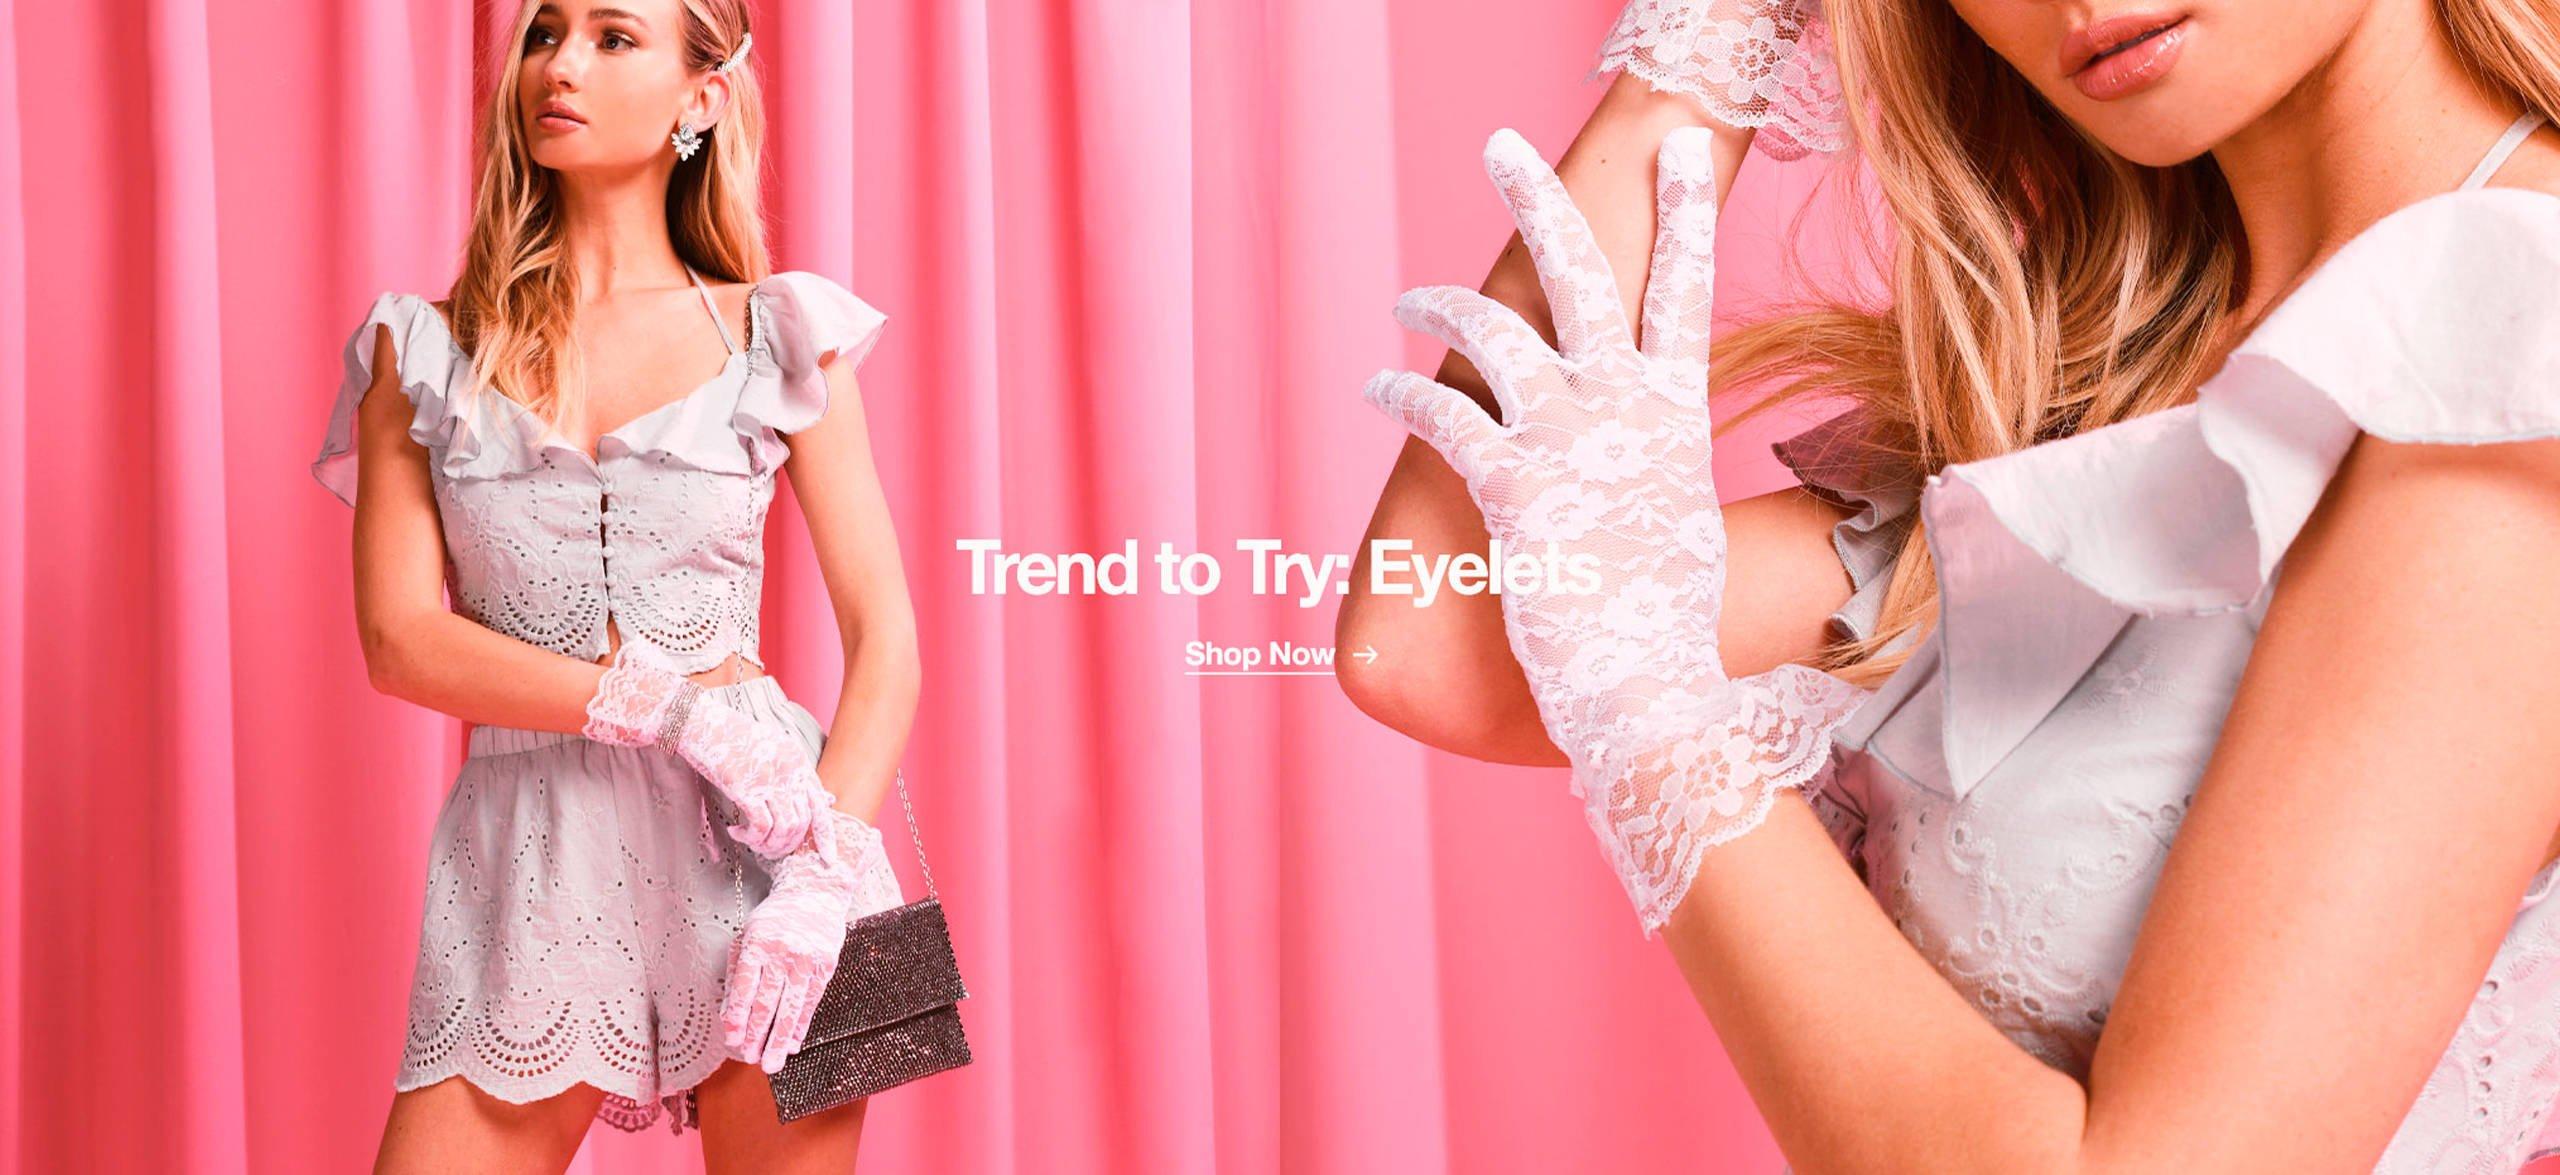 Trend: Eyelet